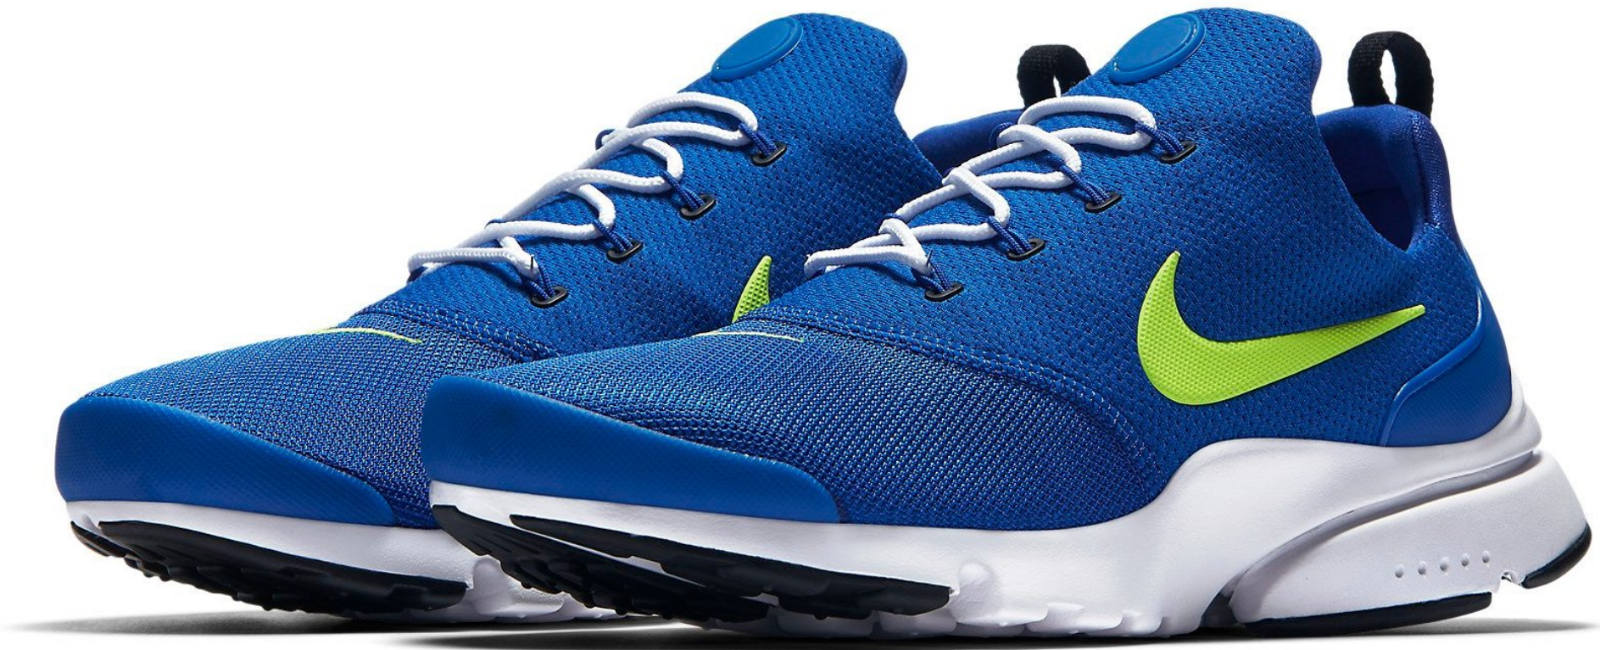 Nike Presto Fly Size 9.5 M (D) EU 43 Men's Running shoes Royal Volt 908019-407